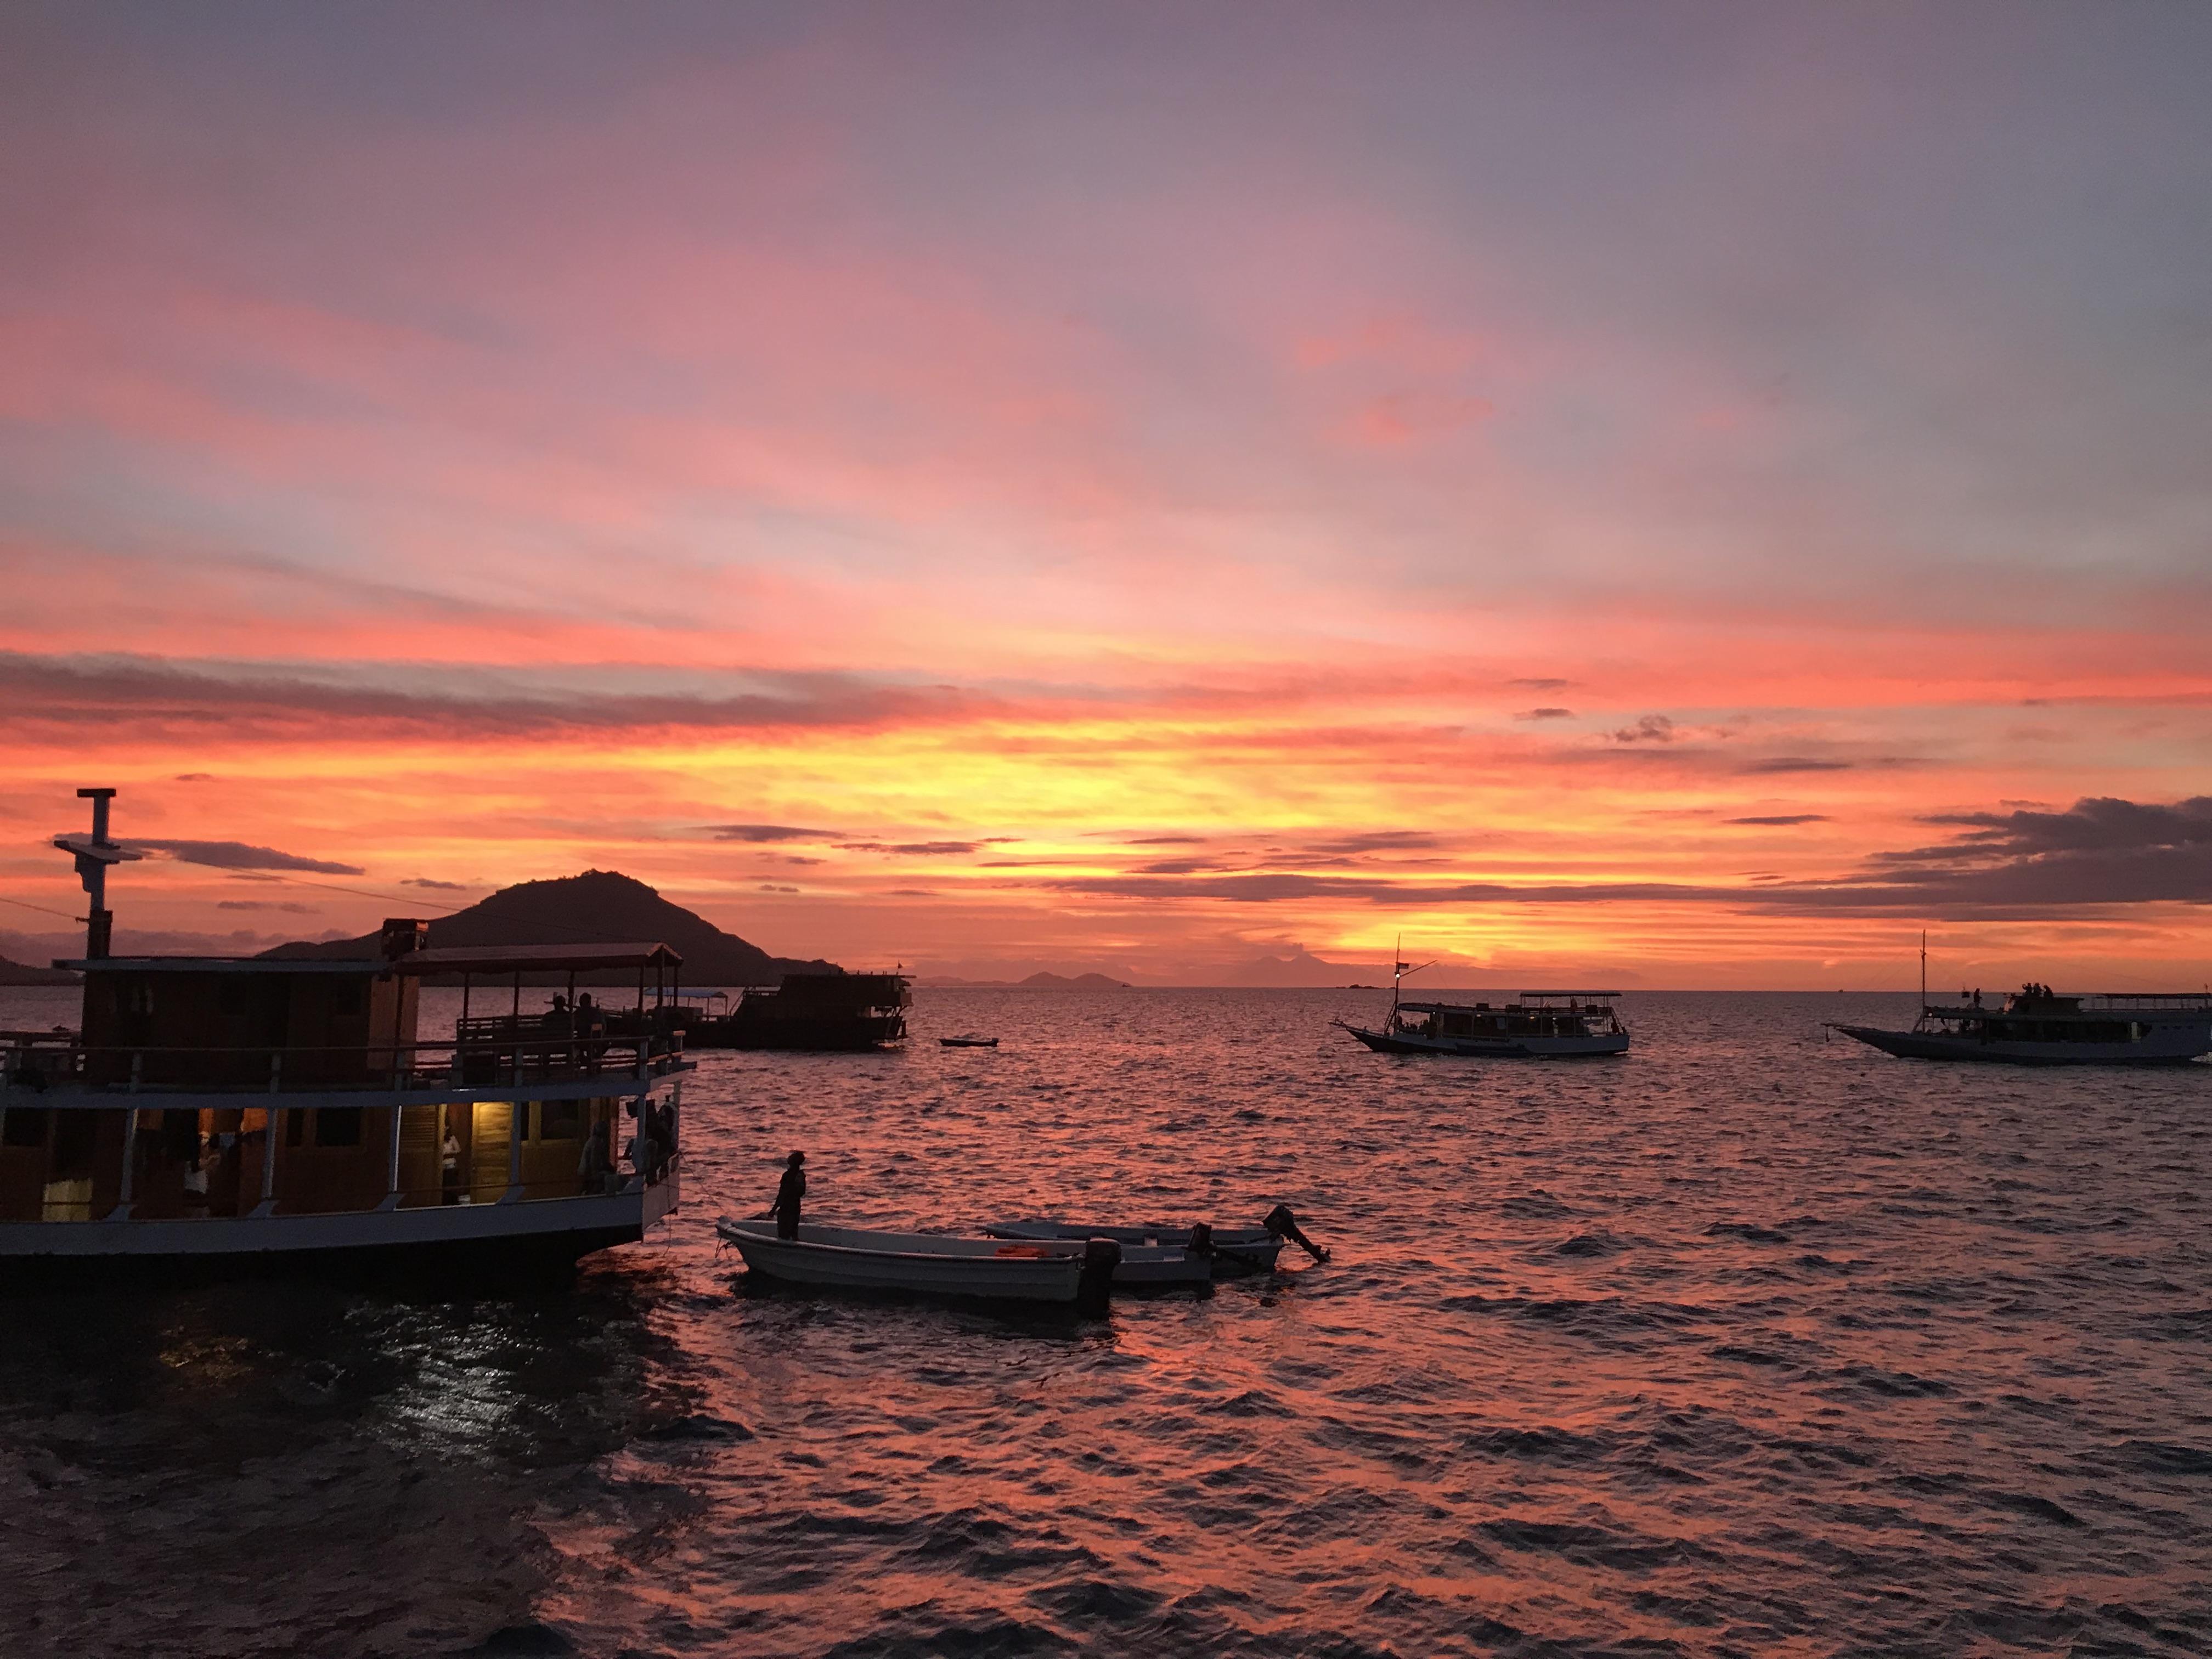 sunset+komodo.JPG